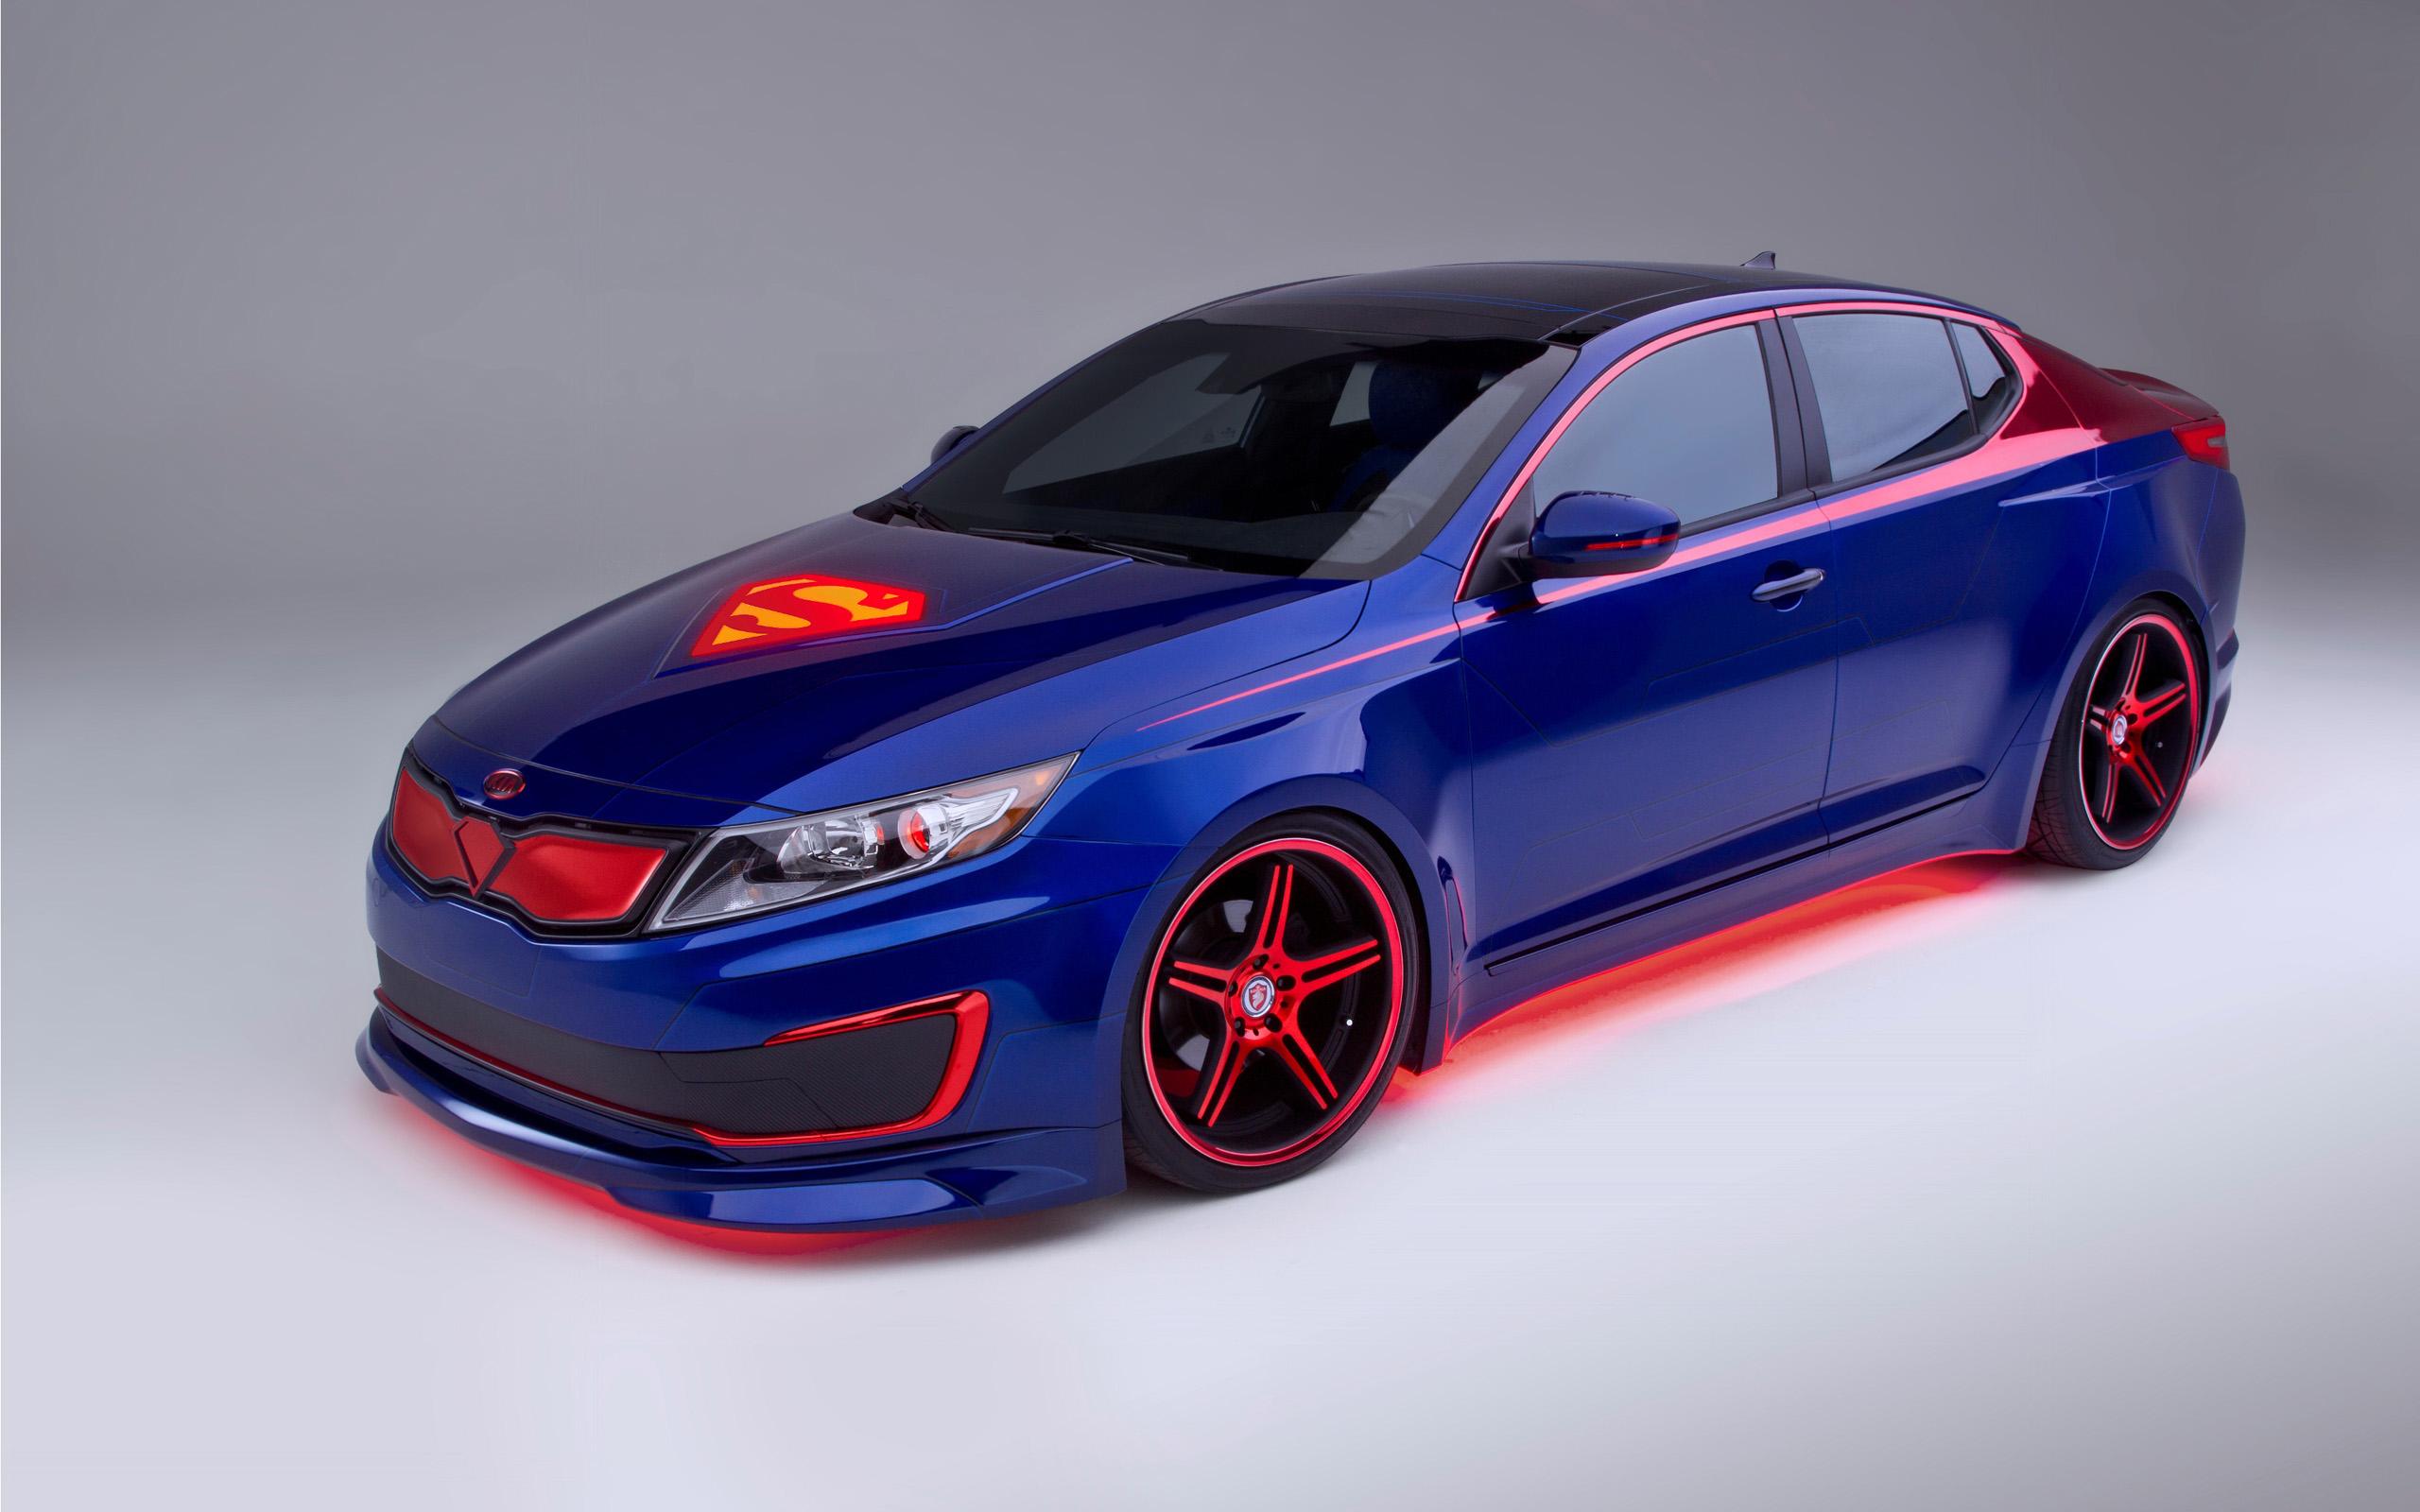 2013 kia superman optima hybrid wallpaper hd car wallpapers wallpaper voltagebd Image collections